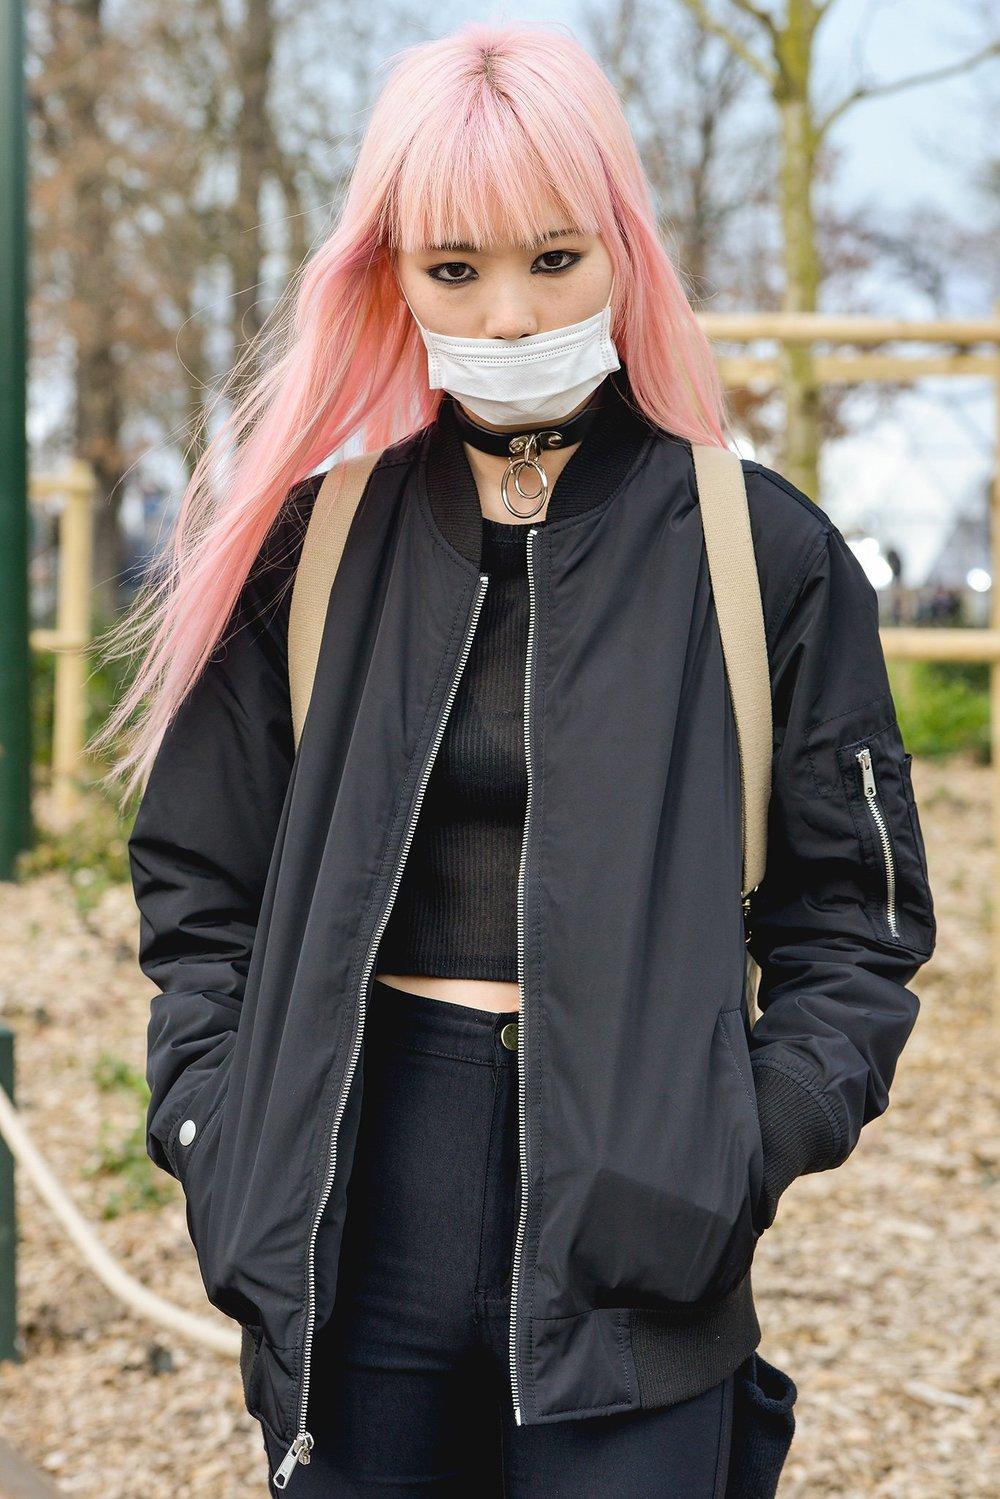 09-bad-girls-trend-street-style.jpg